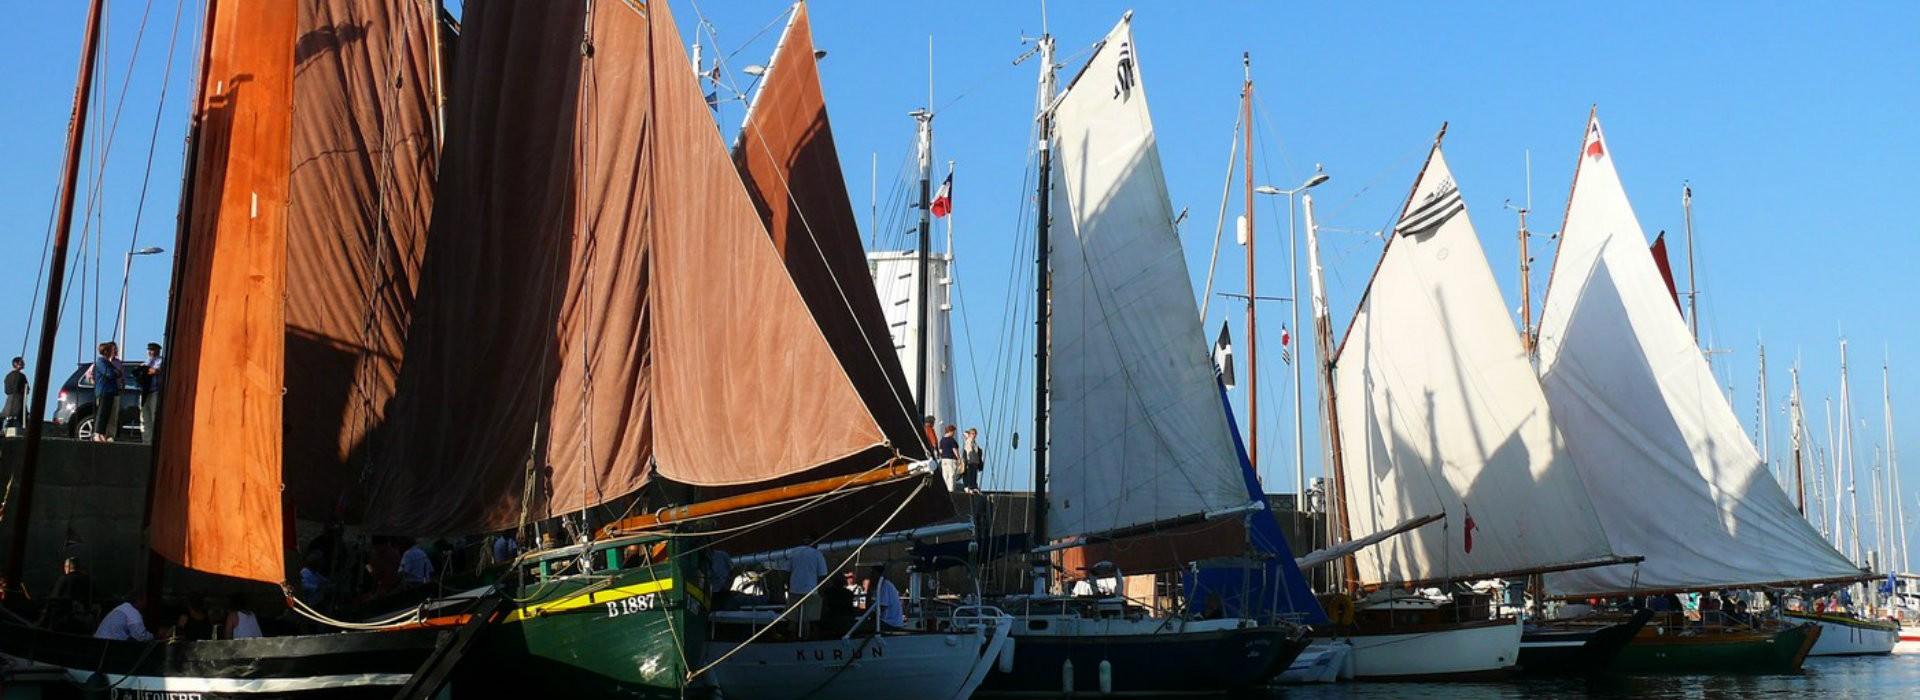 Tout l'Agenda de Piriac-sur-mer - Bruno Schoch